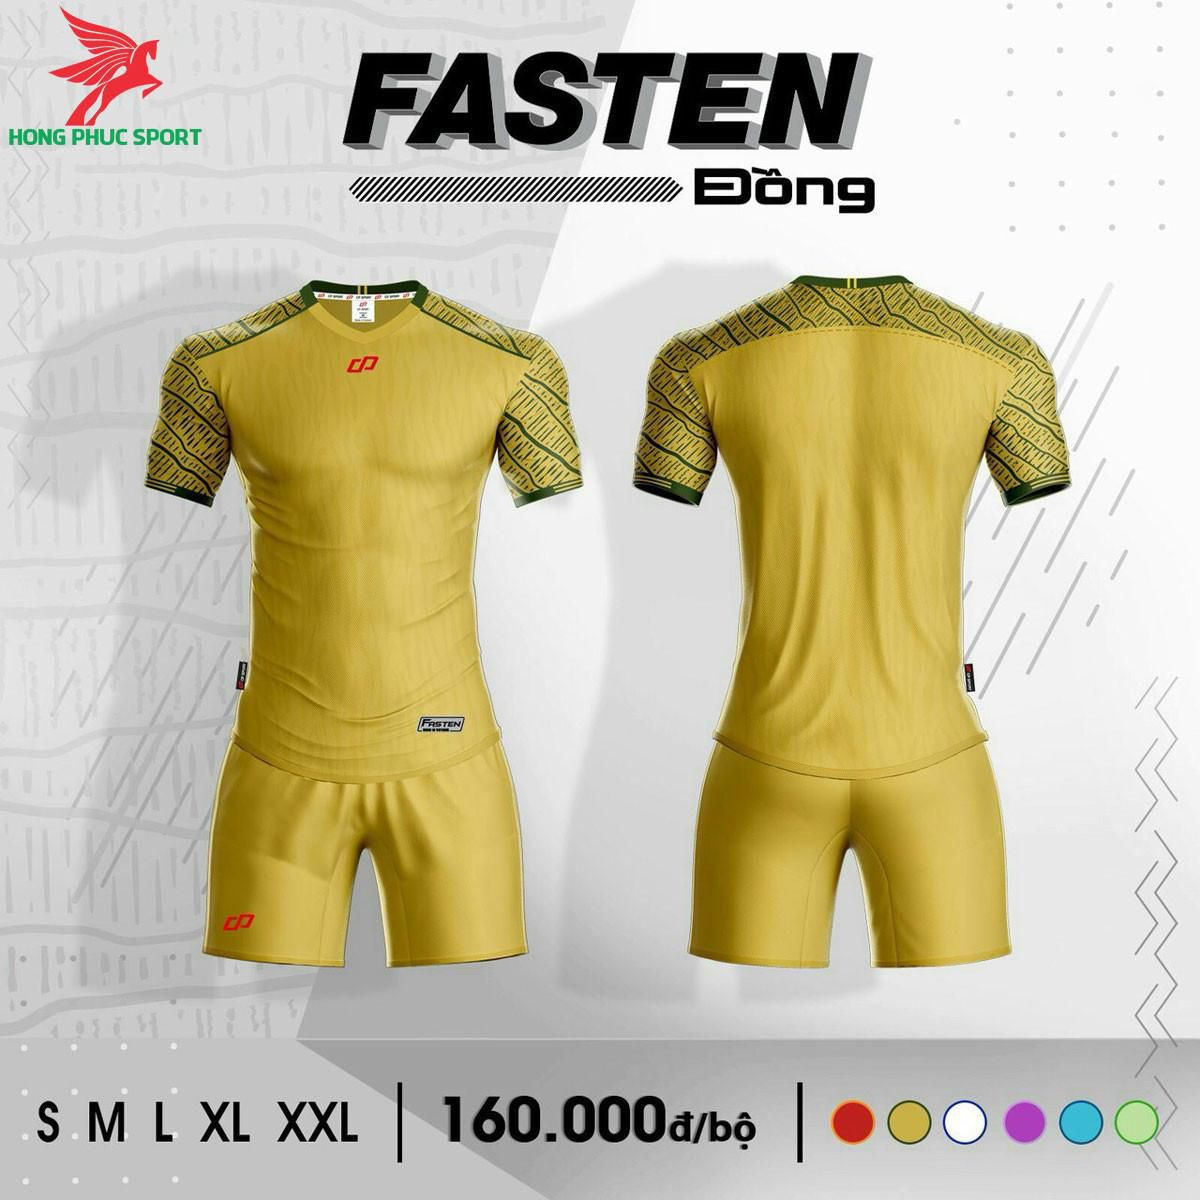 https://cdn.hongphucsport.com/unsafe/s4.shopbay.vn/files/285/ao-da-bong-khong-logo-cp-fasten-mau-dong-60505cf45e8e7.jpg